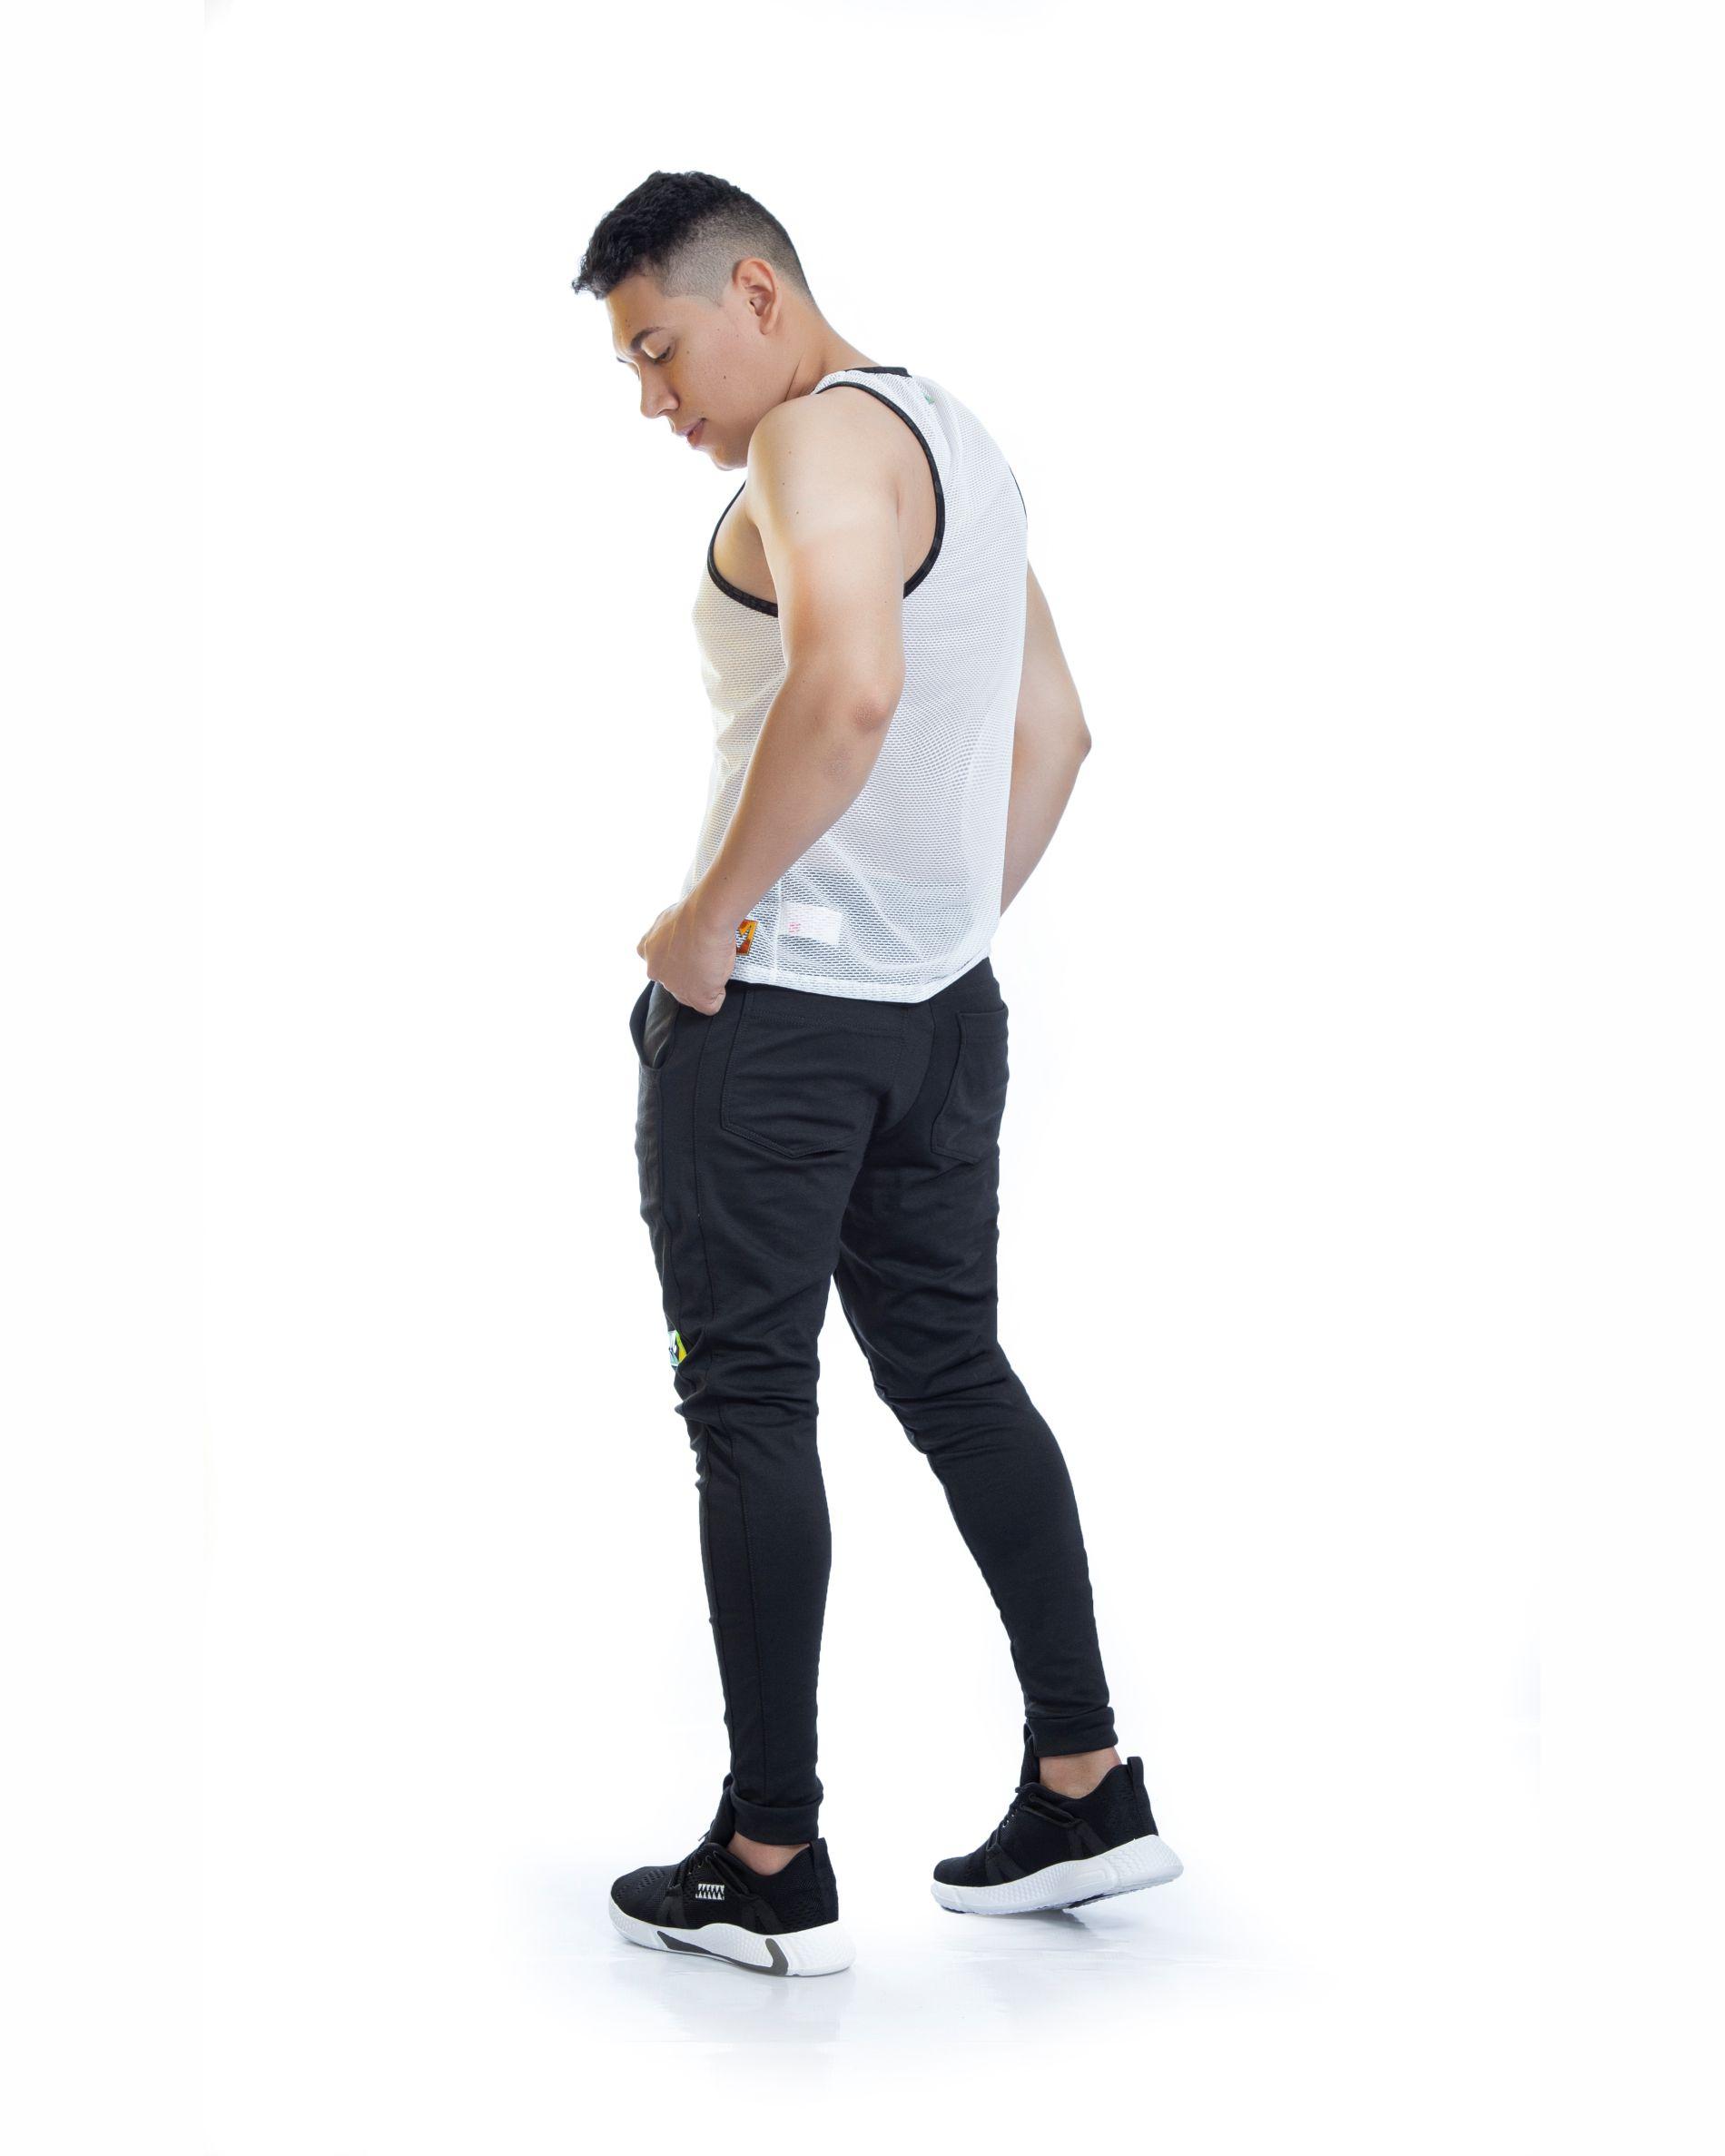 ref 1712 001 Sudadera jogger black gold, tela 98% algodon mas 2% de expande, altura del modelo 75 cm $72 mil